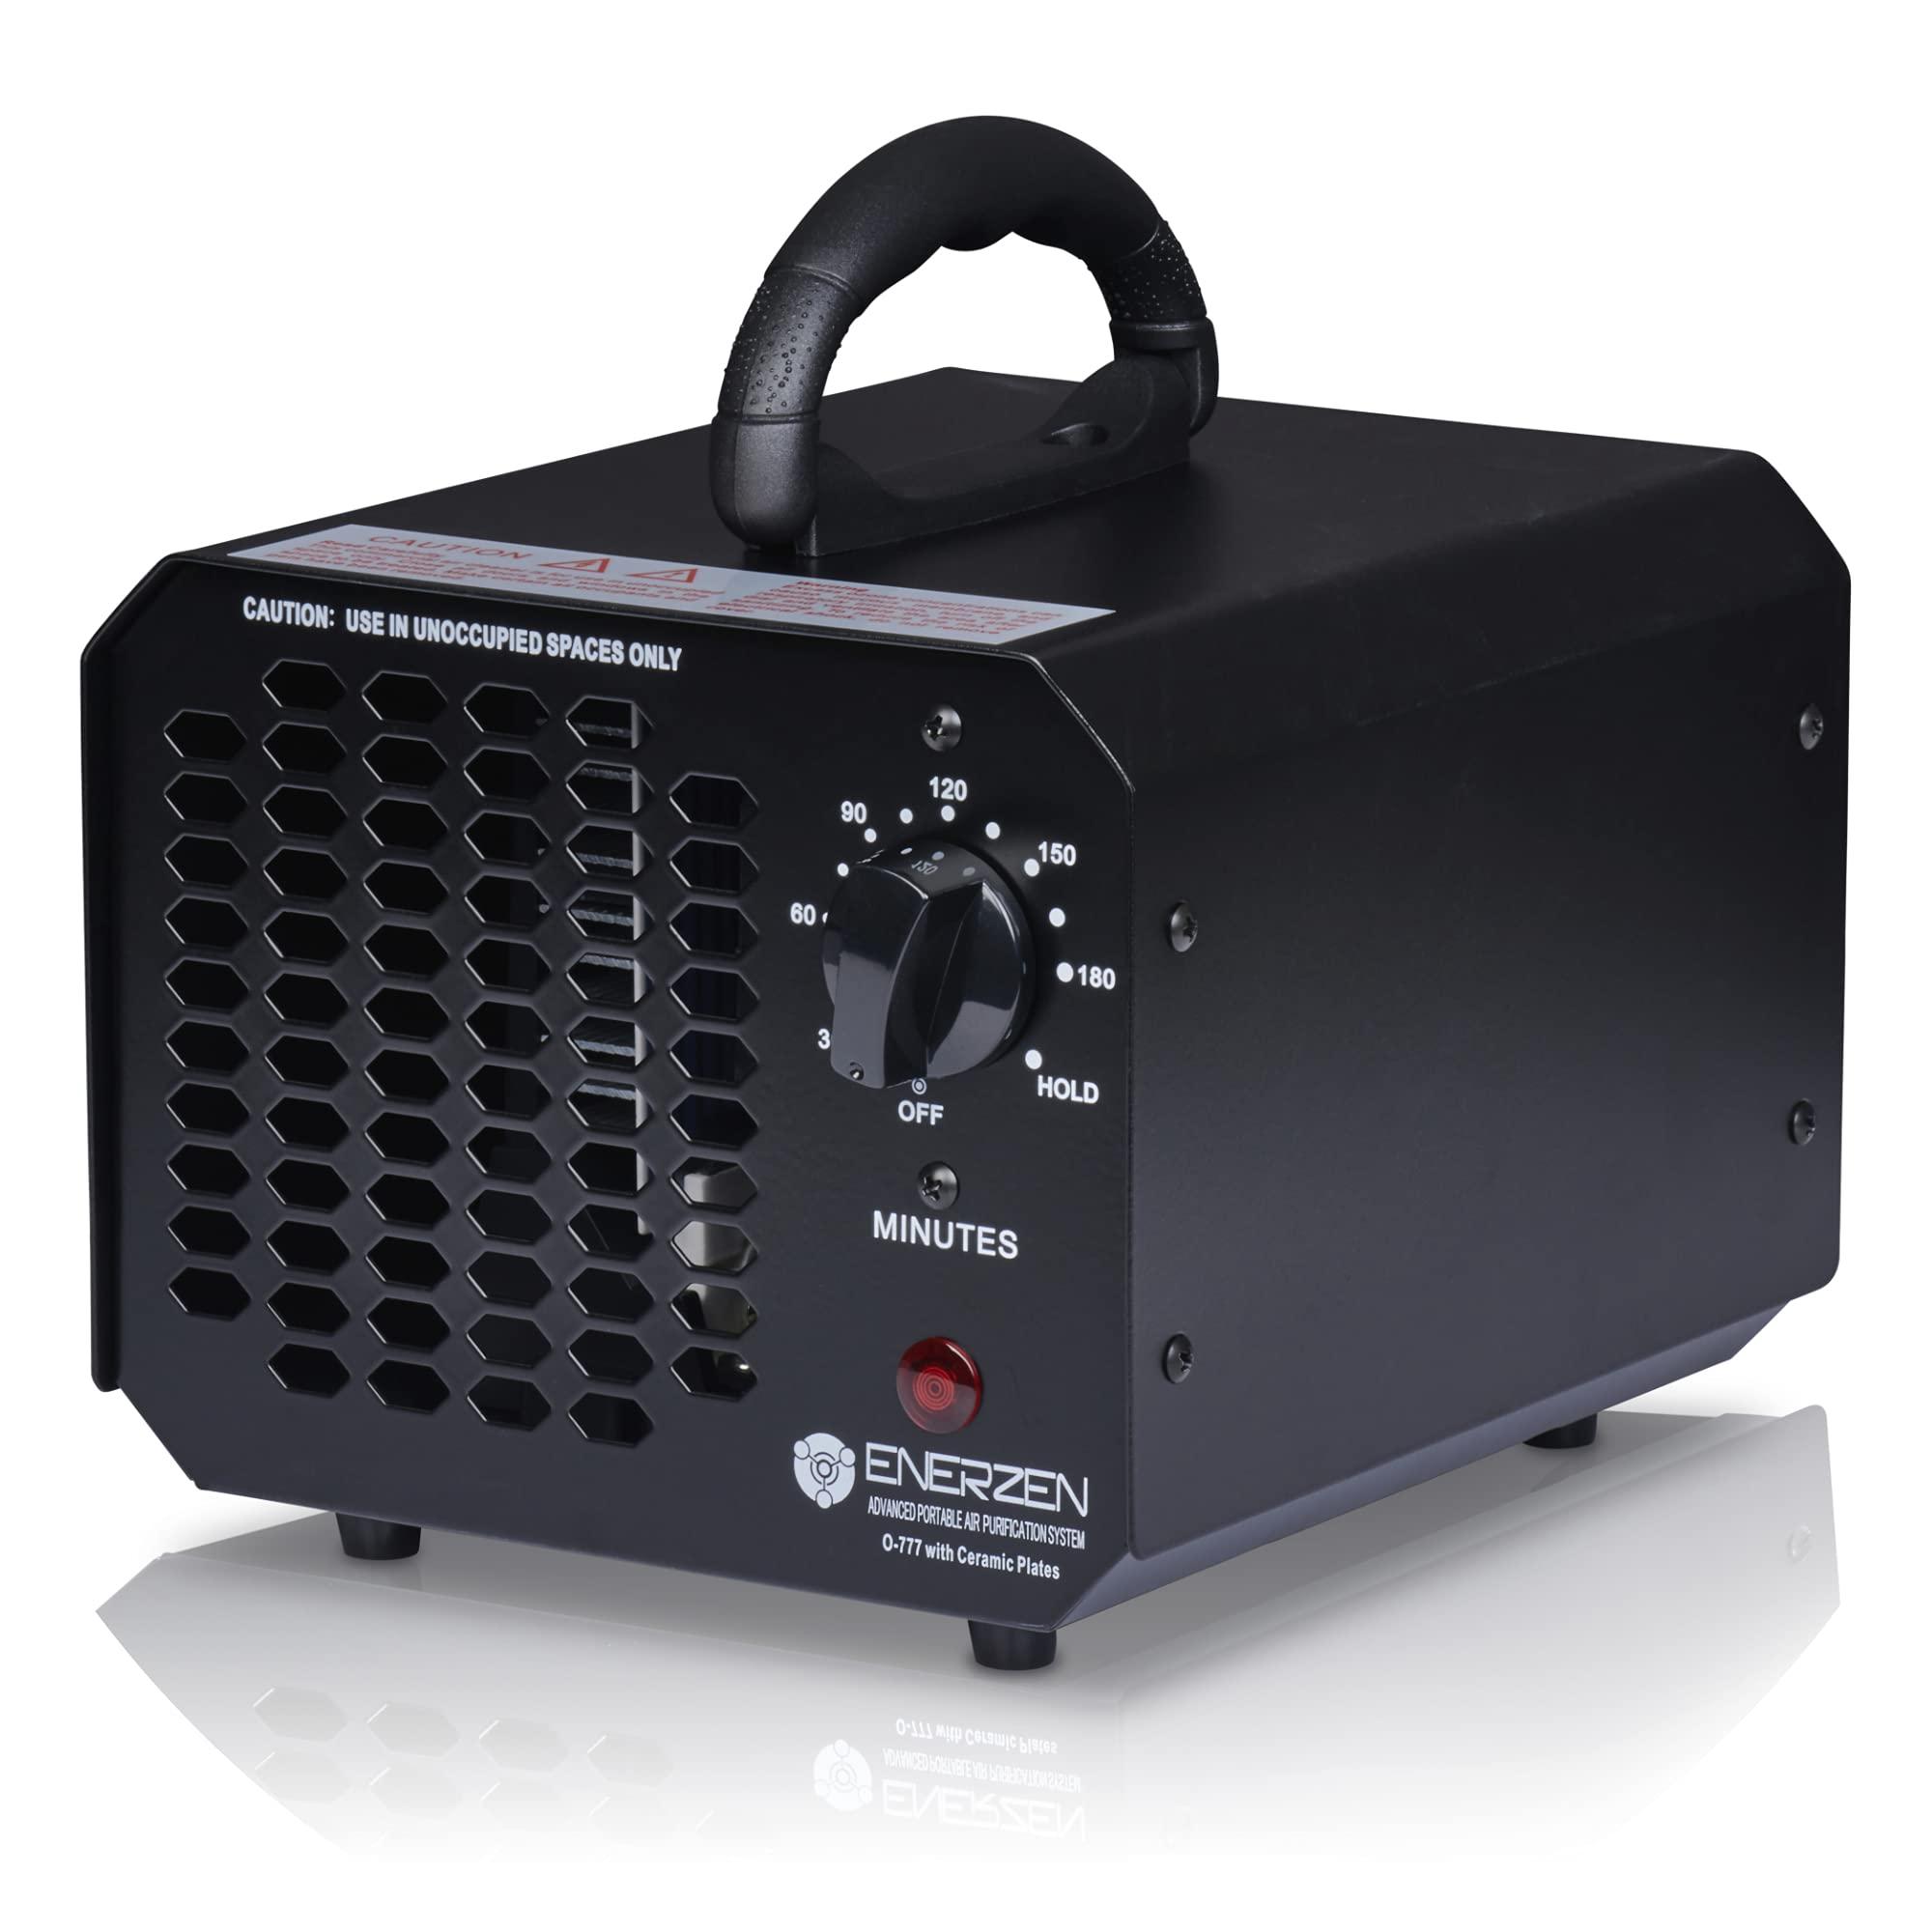 Enerzen Ozone Generator 6,000mg Industrial O3 Air Purifier Deodorizer Sterilizer (6,000mg - Black)